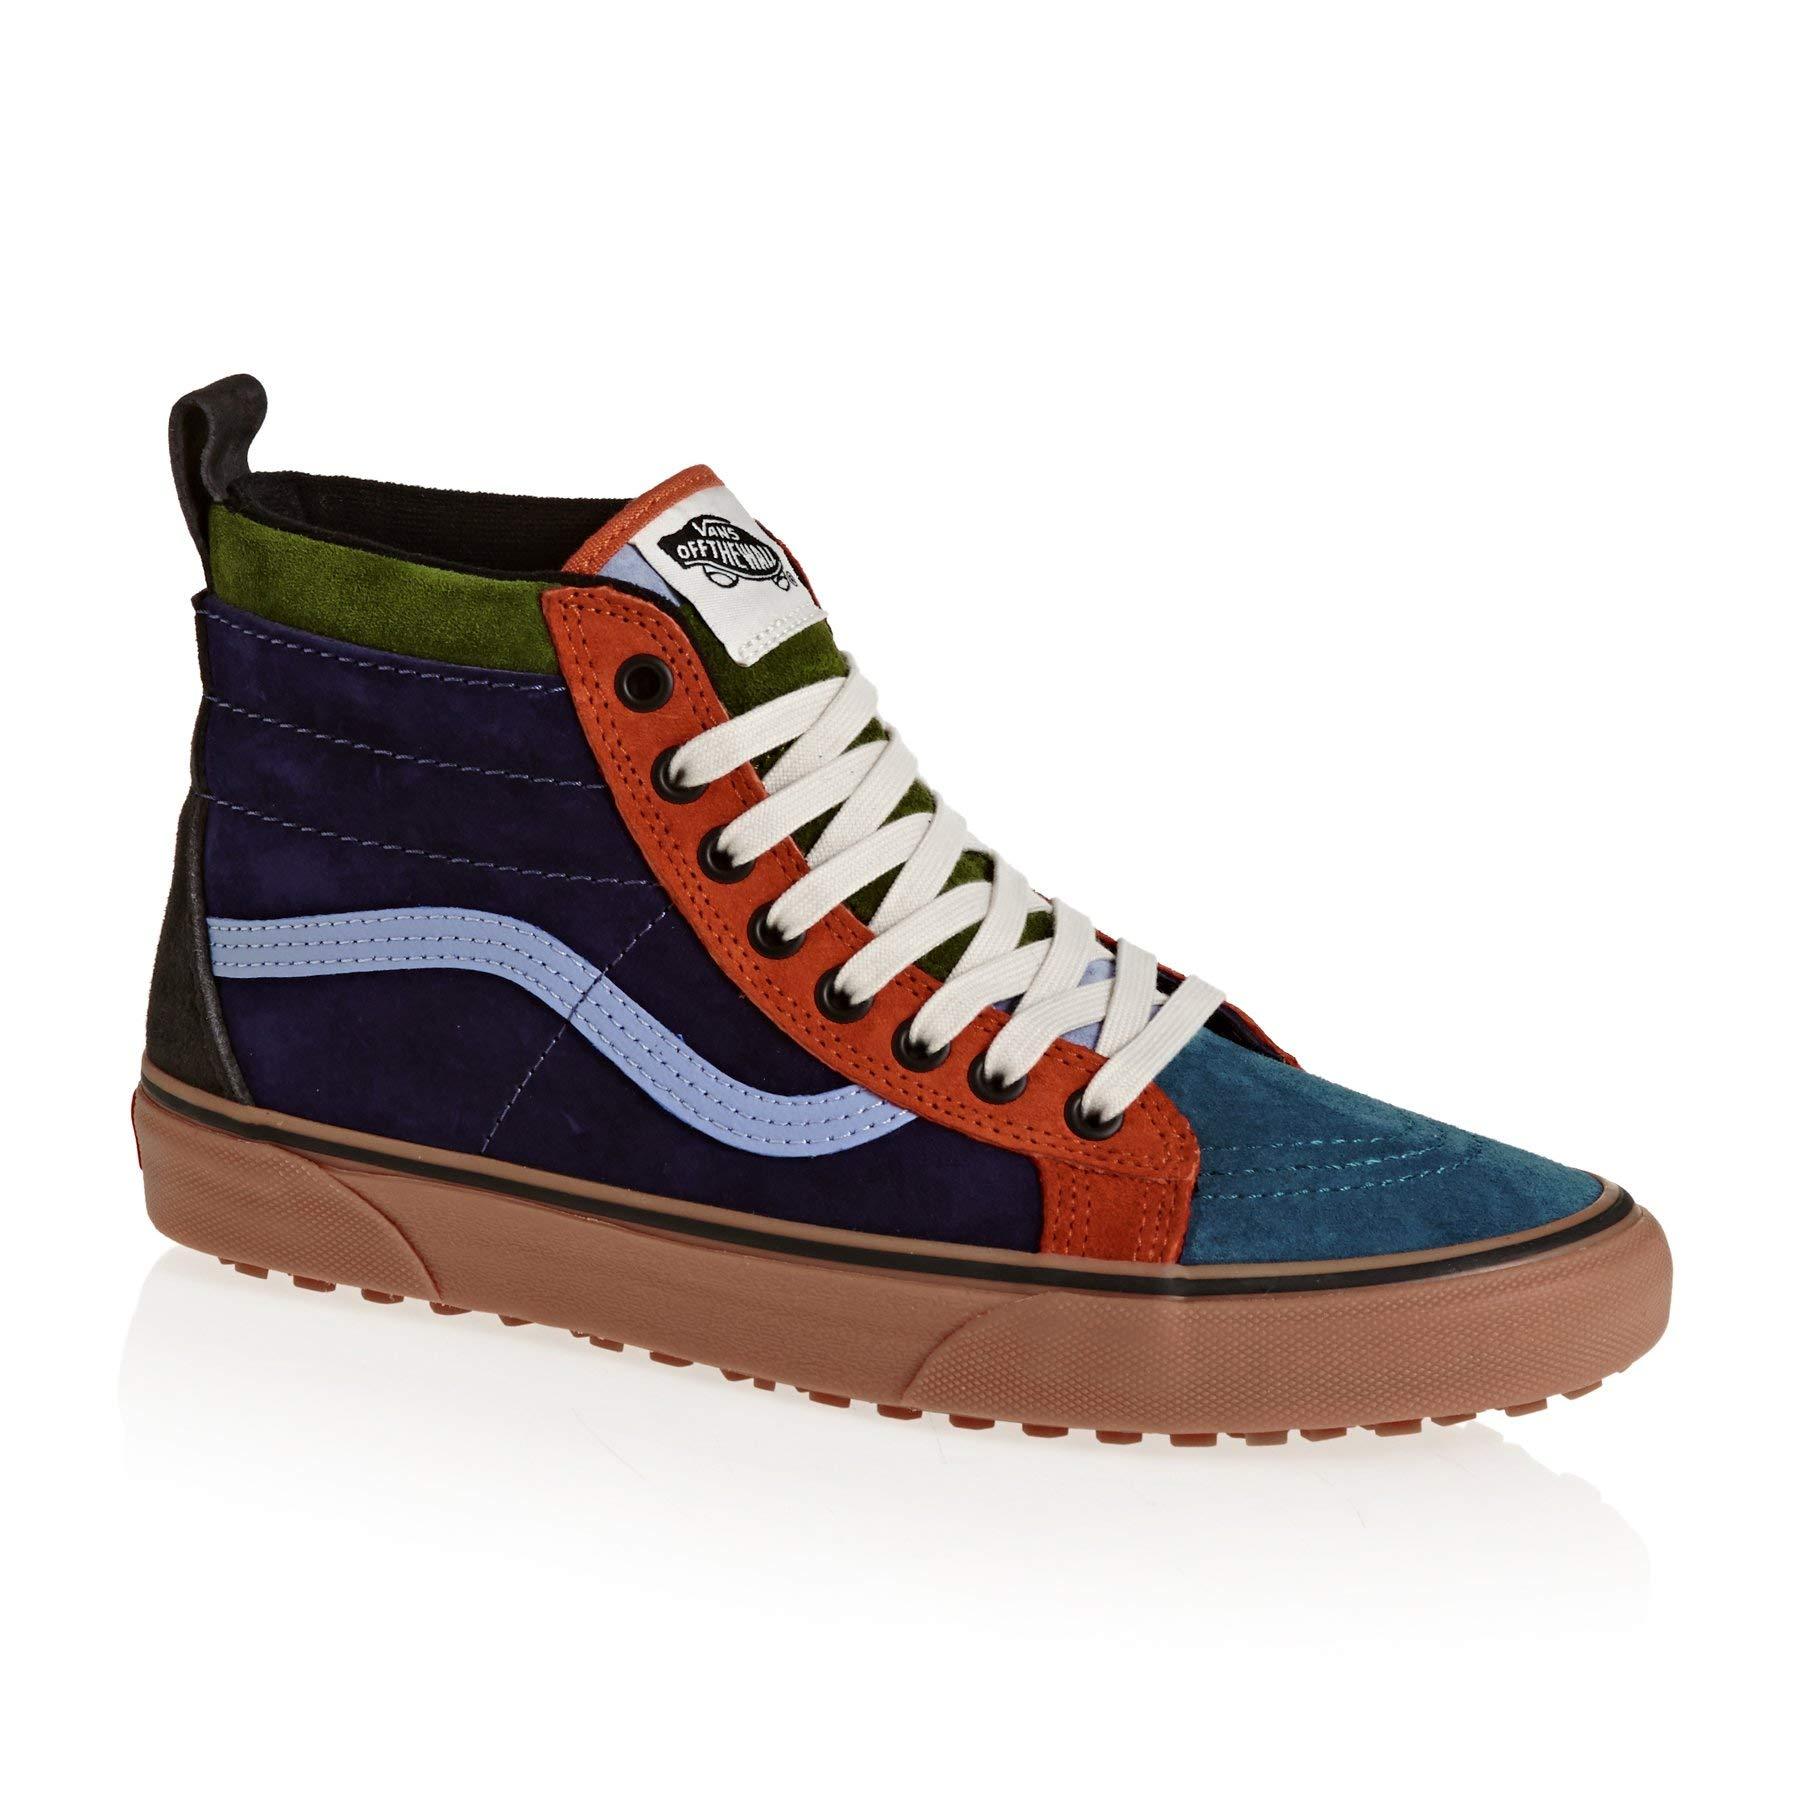 Vans Sk8 Hi MTE Shoes 6.5 B(M) US Women